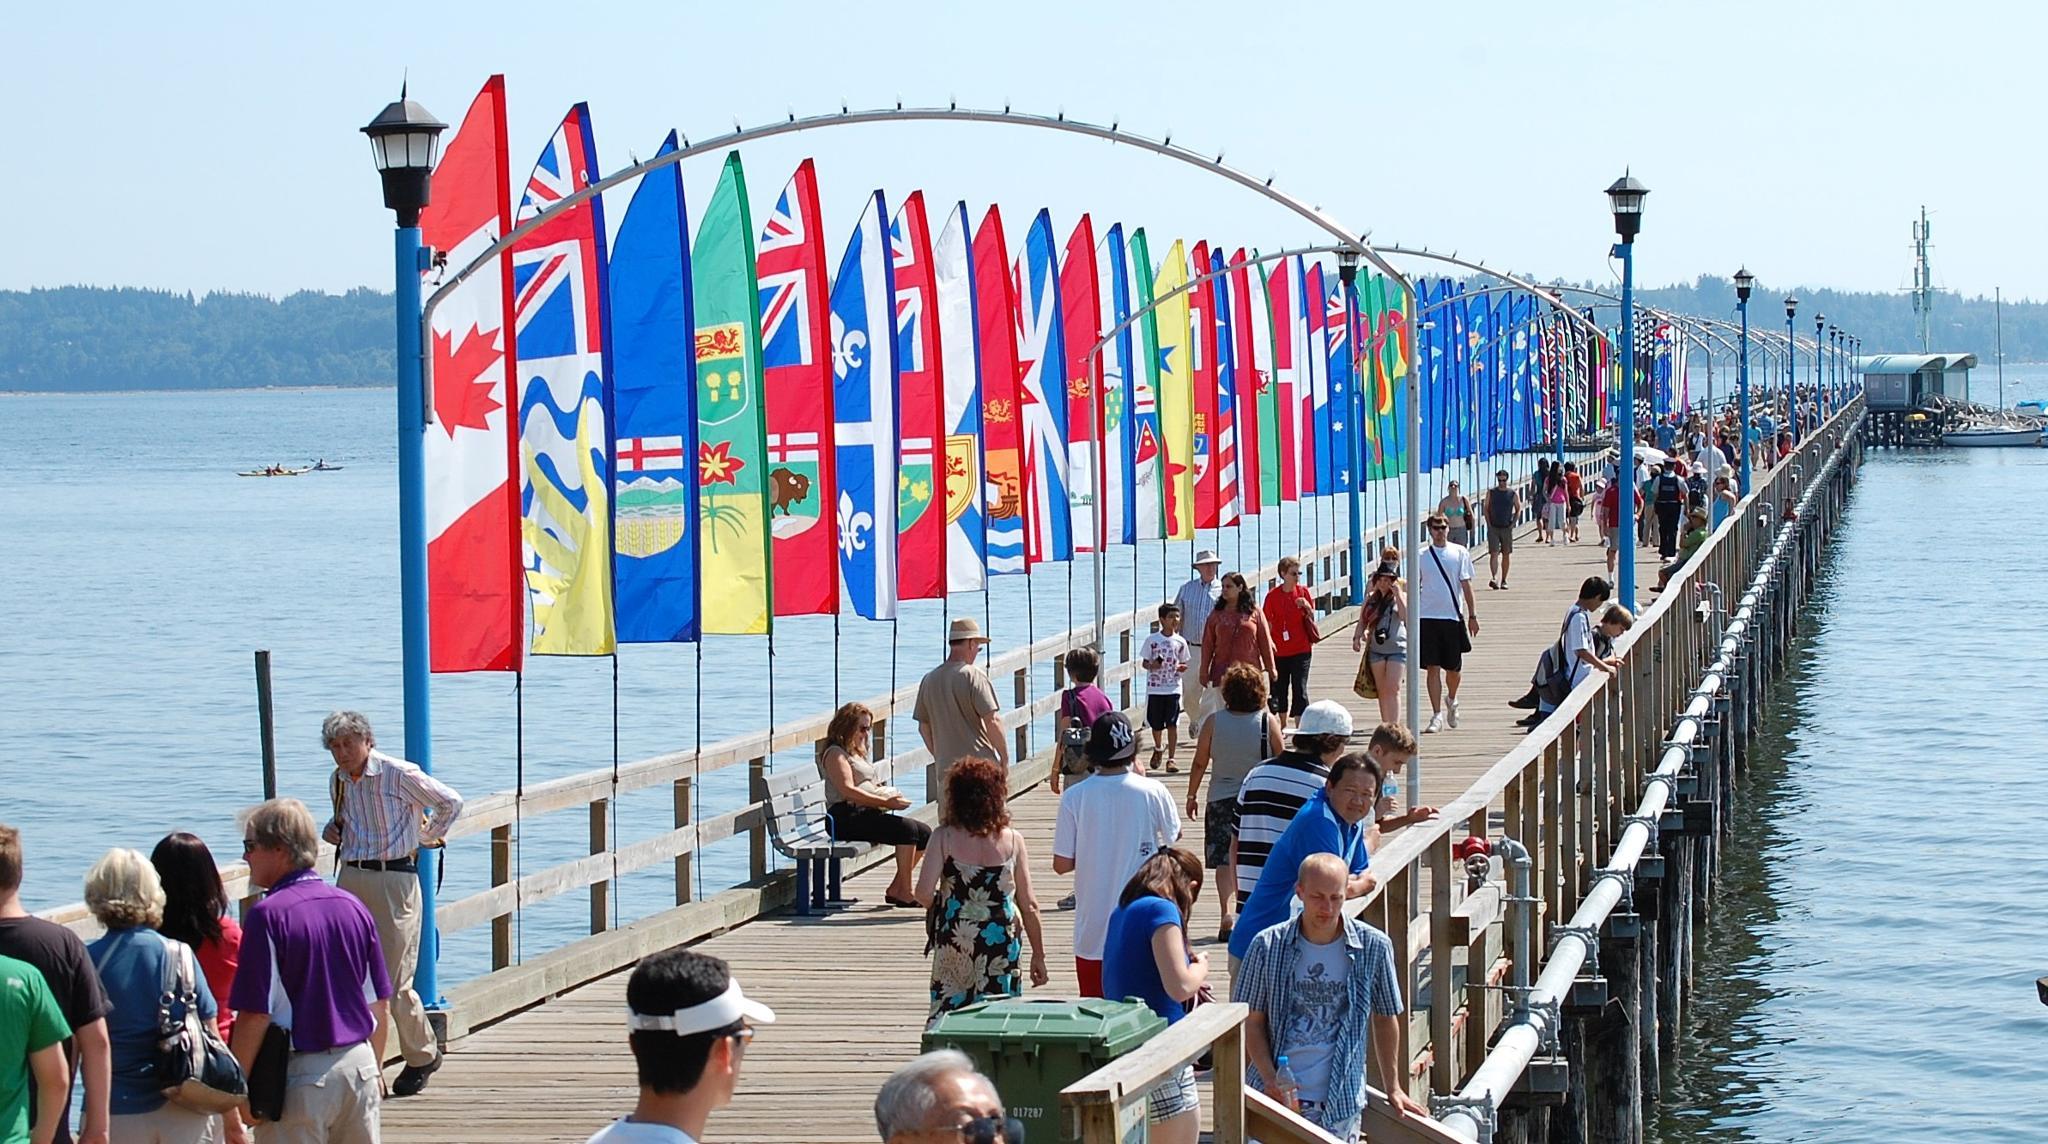 Boardwalk by CindyLou